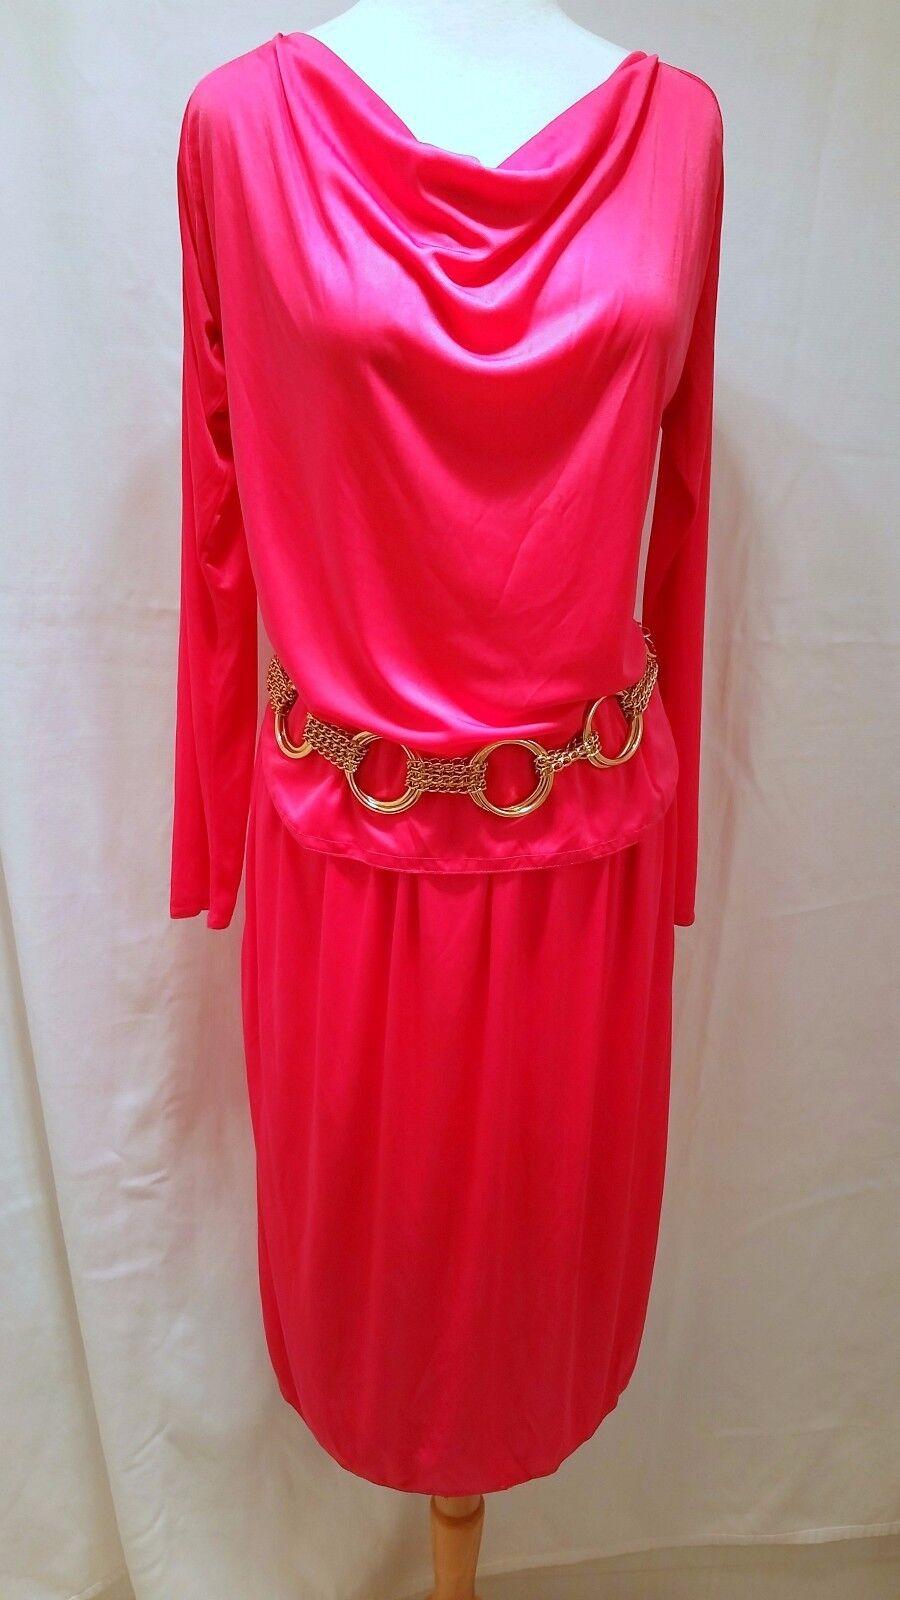 Rare Vintage 1970's Diane von Furstenberg DVF Rosa Dress set - Union Label sz 10